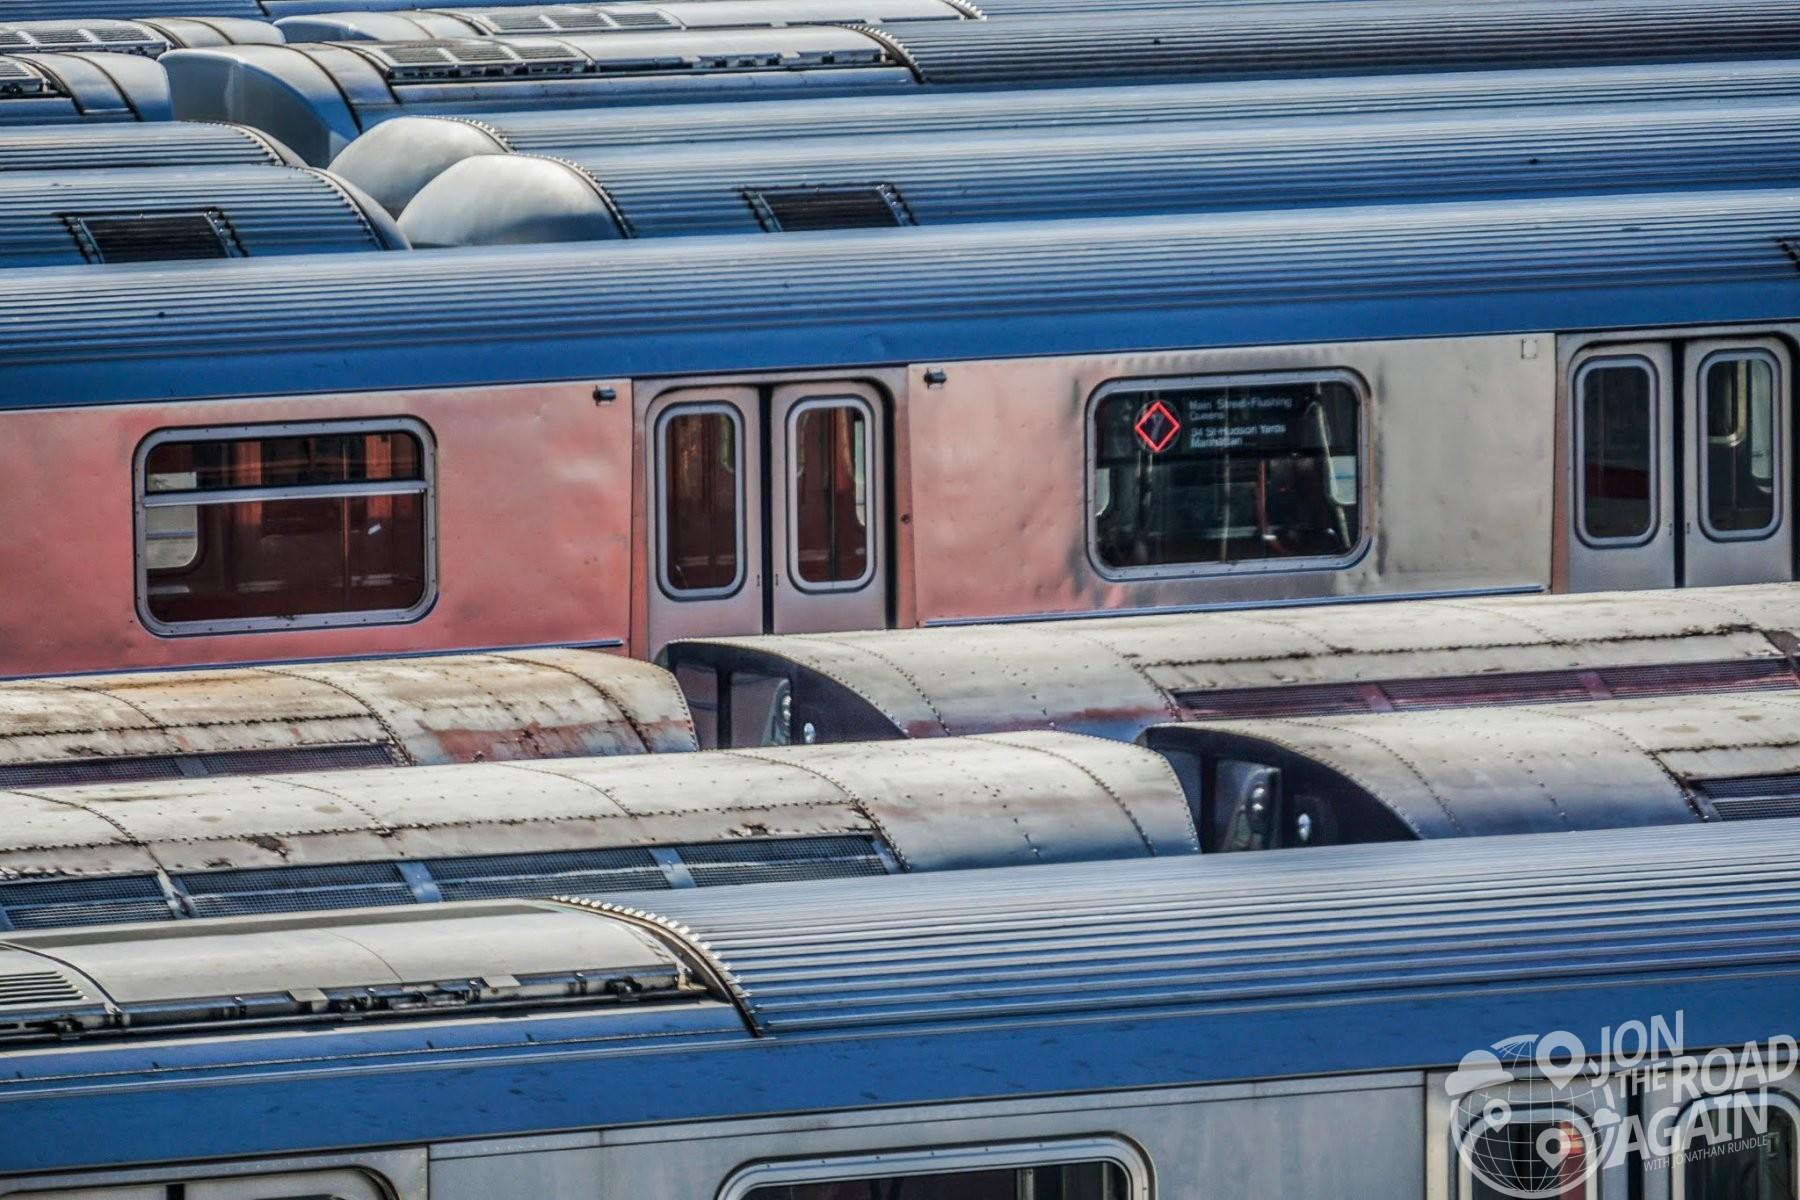 7 Line Subway Trains